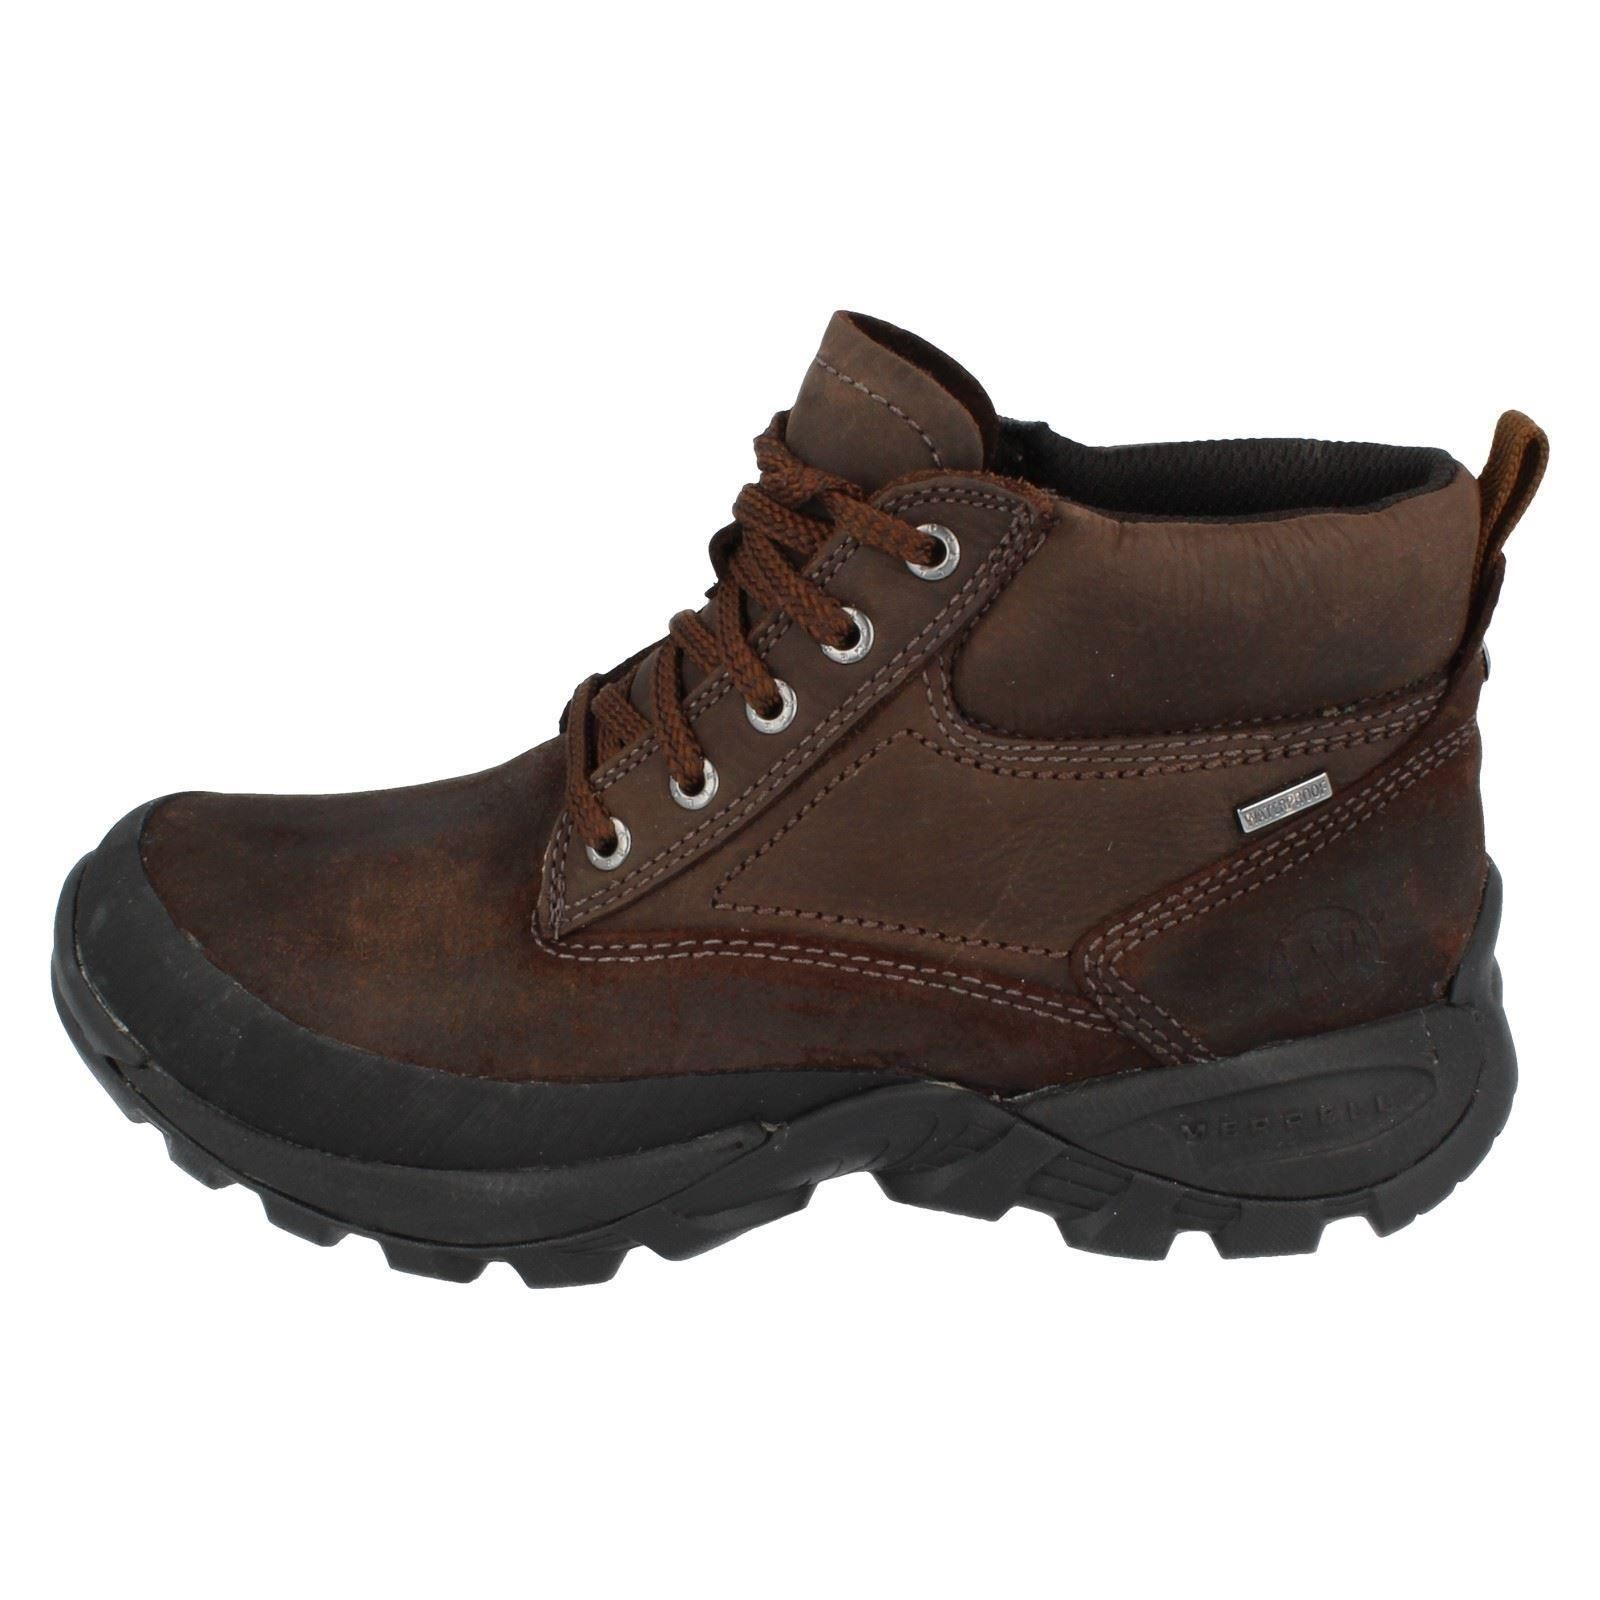 Mens Merrell Merrell Merrell Lace Up Ankle Stiefel 'Arlberg Waterproof' 5190b5